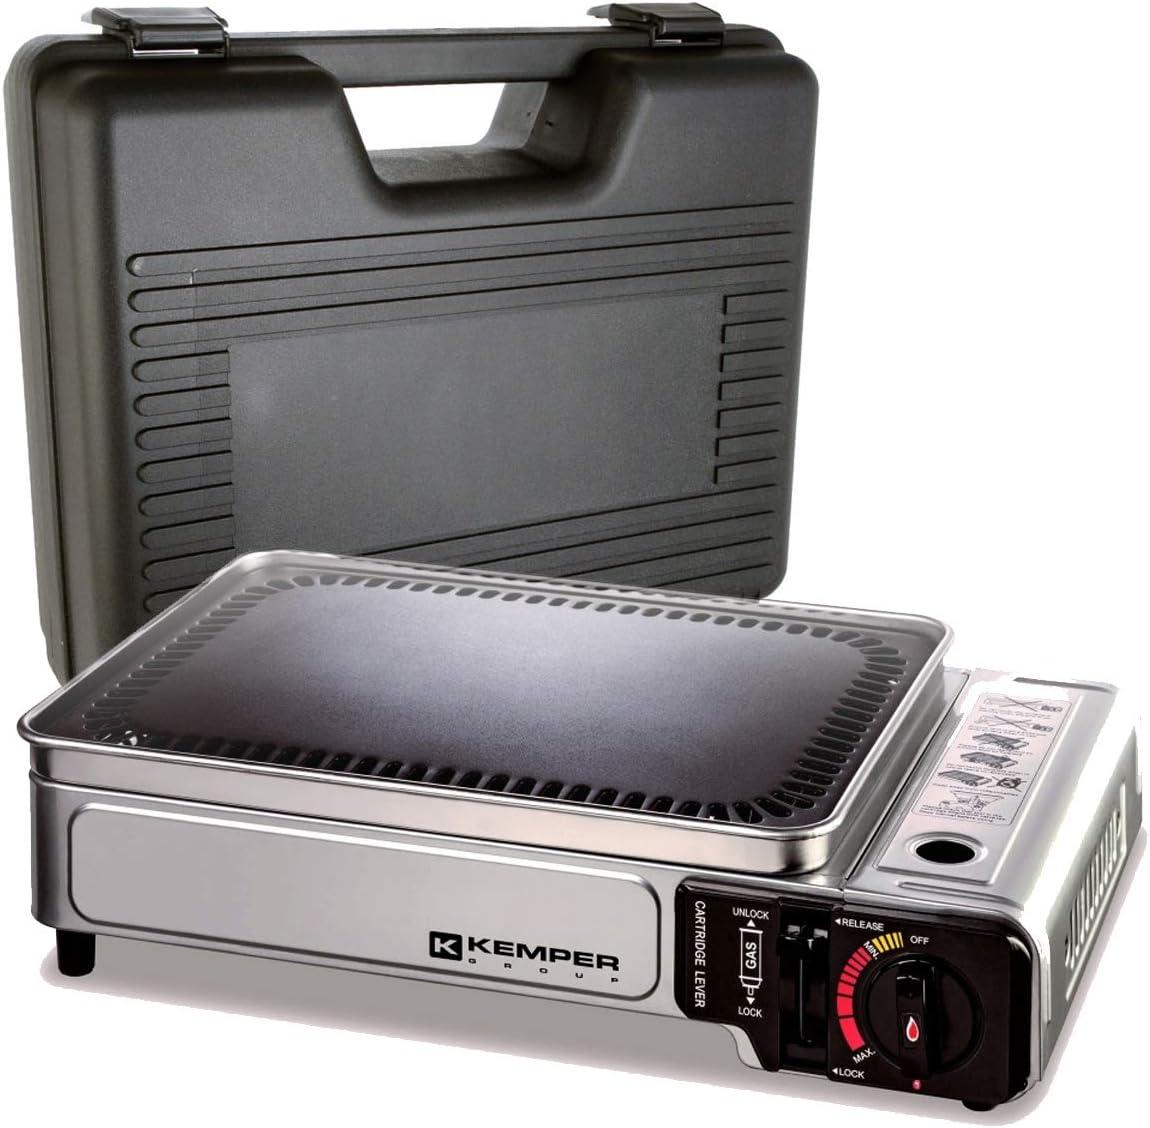 Plancha de gas portátil 2300 W Kemper placa antiadherente maleta de transporte